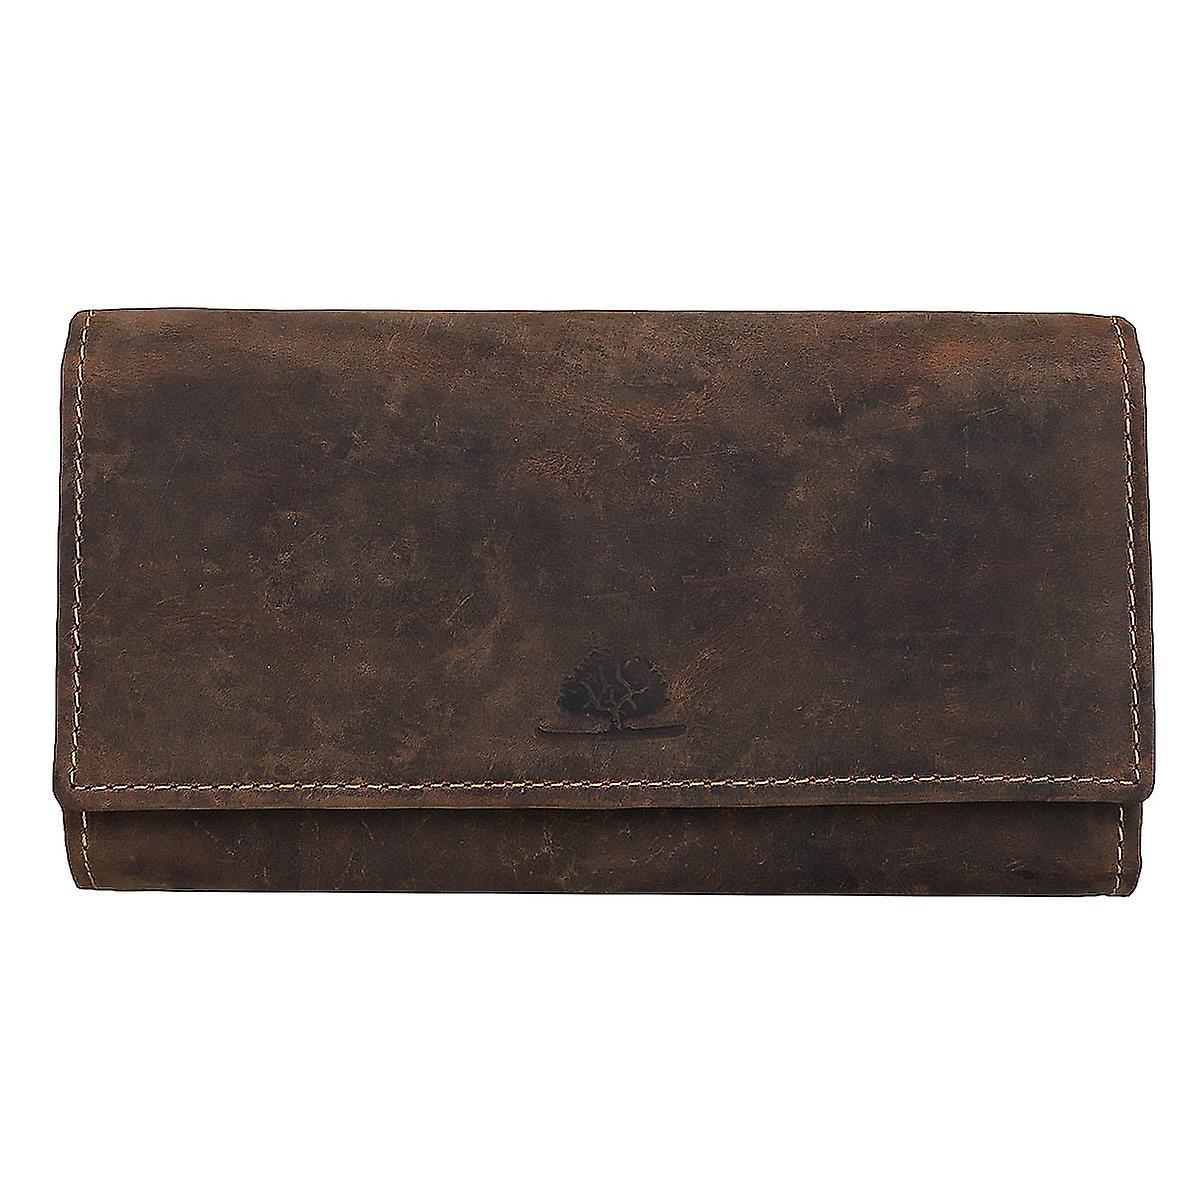 4bea77b778443 Greenburry Vintage Damen Leder Geldbörse Portemonnaie 1669-25